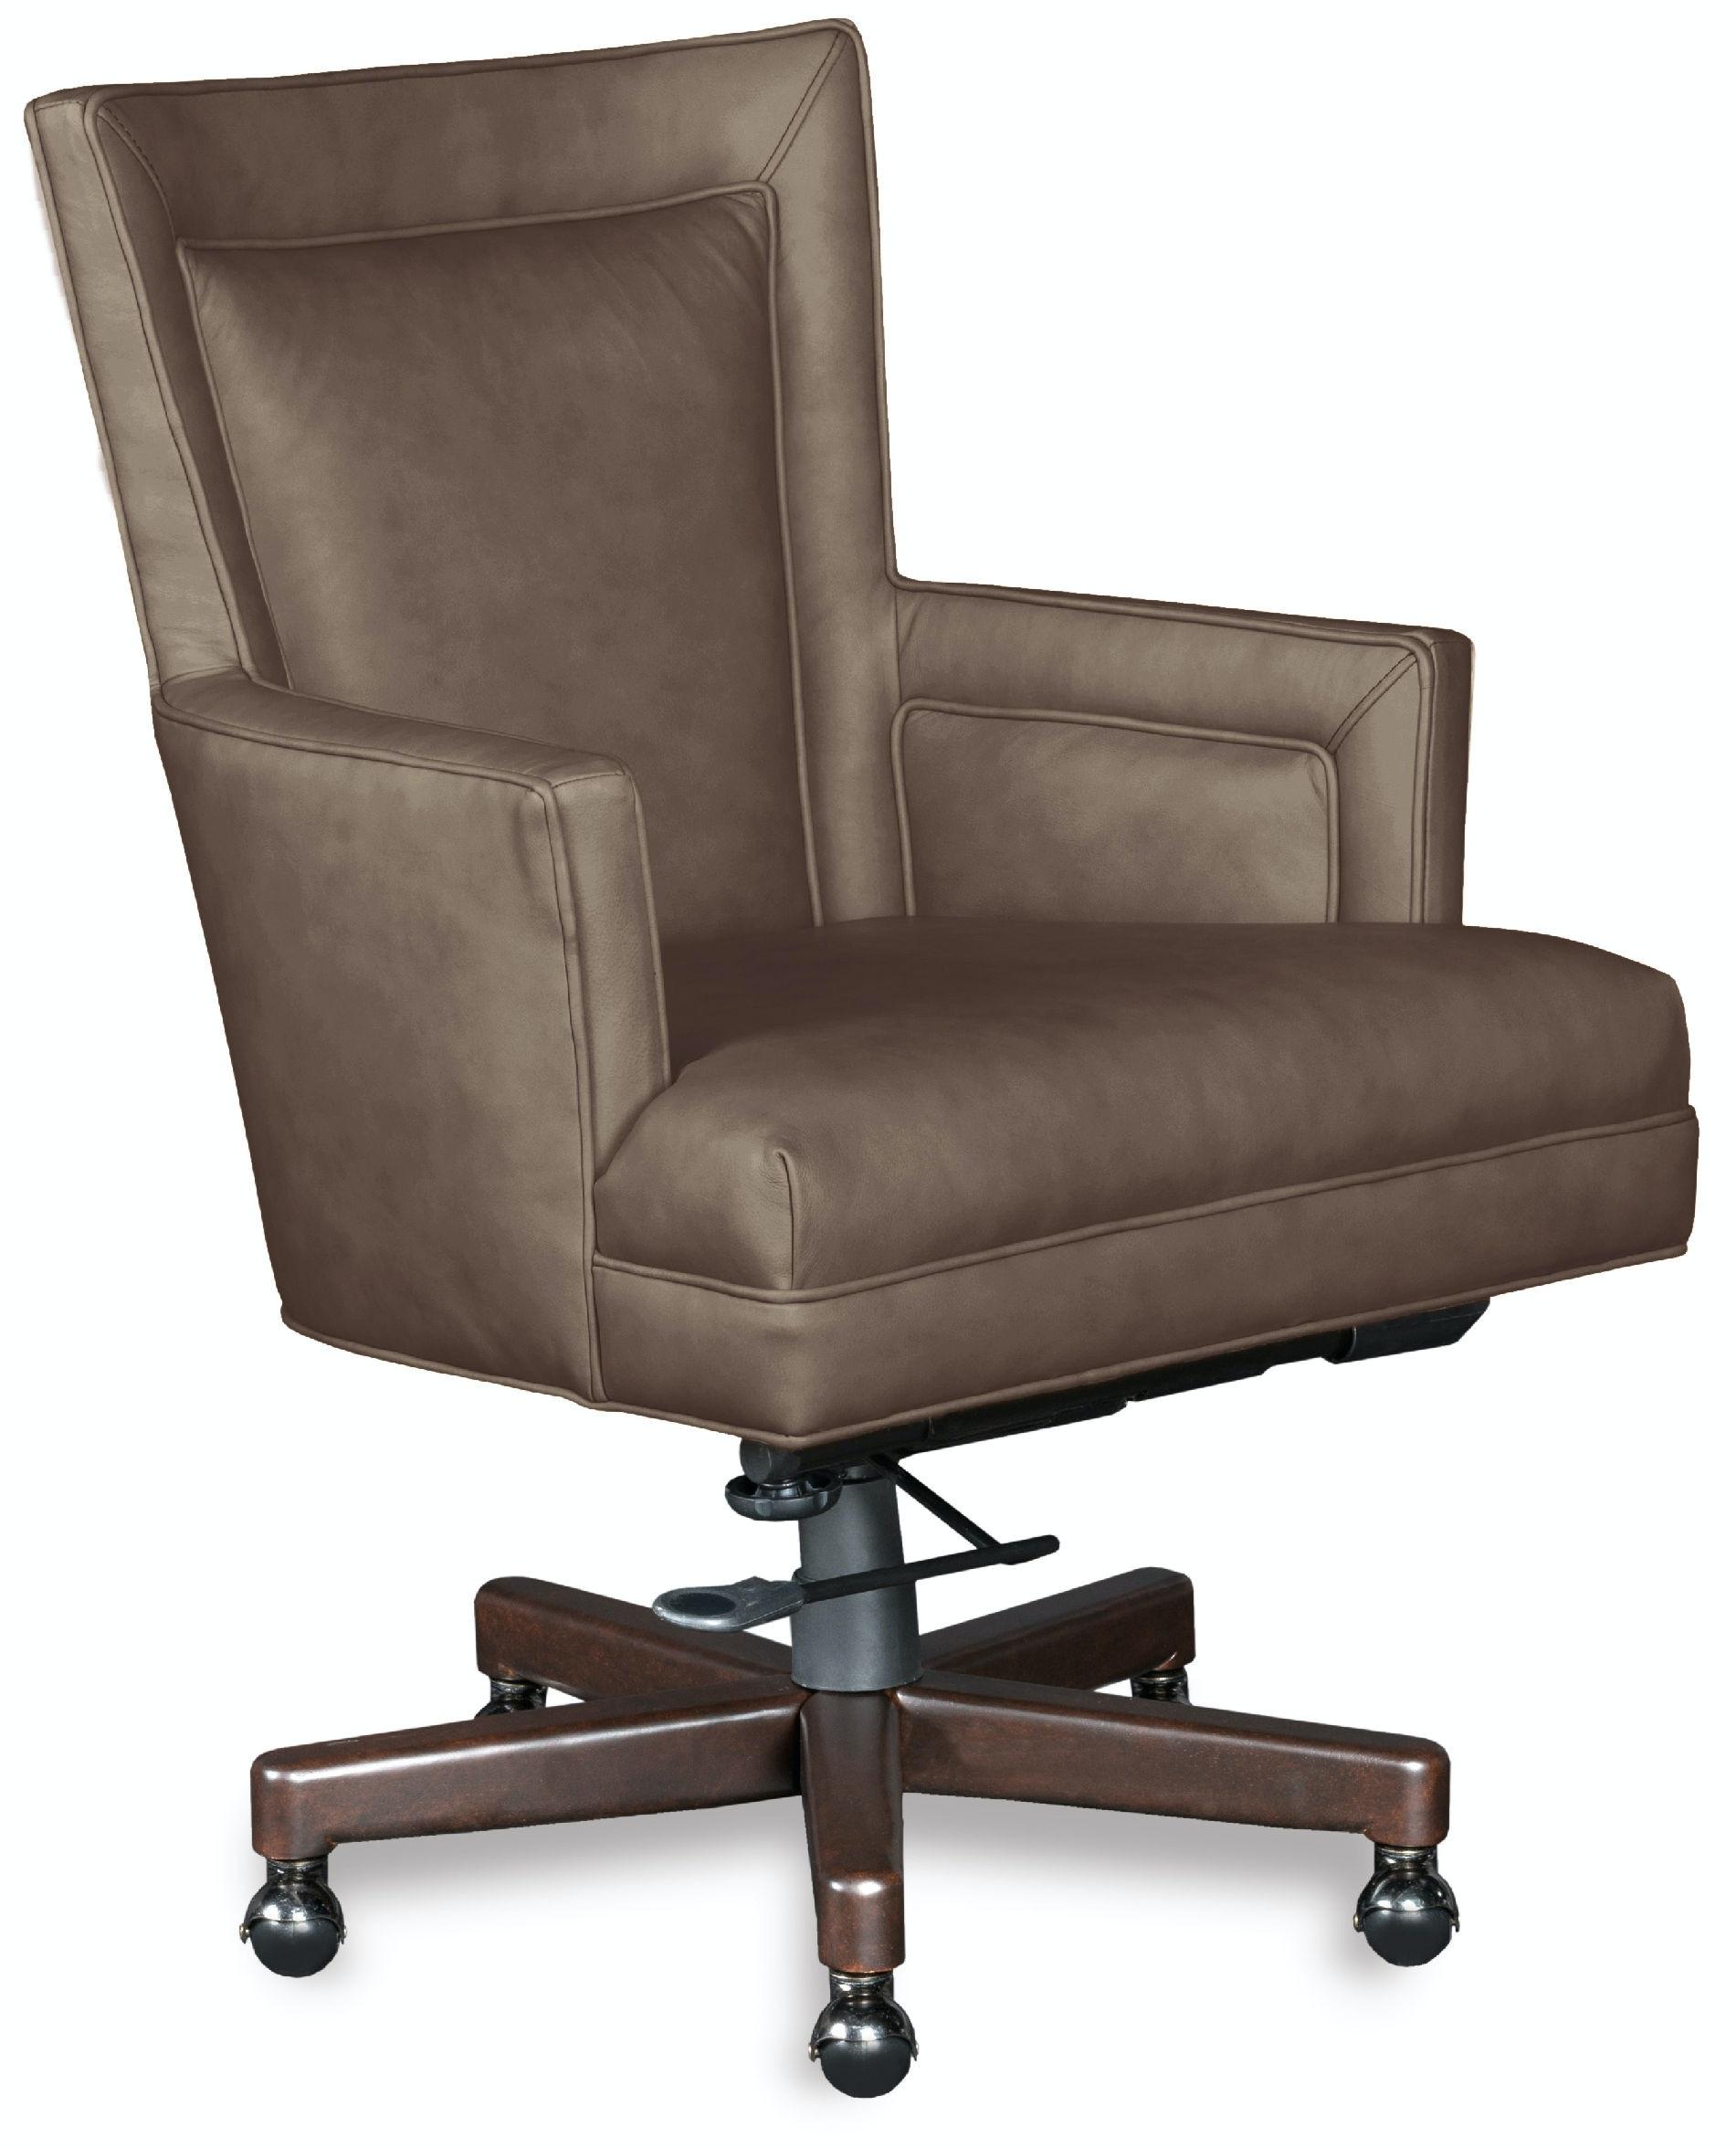 Hooker Furniture Rosa Home fice Chair EC447 084